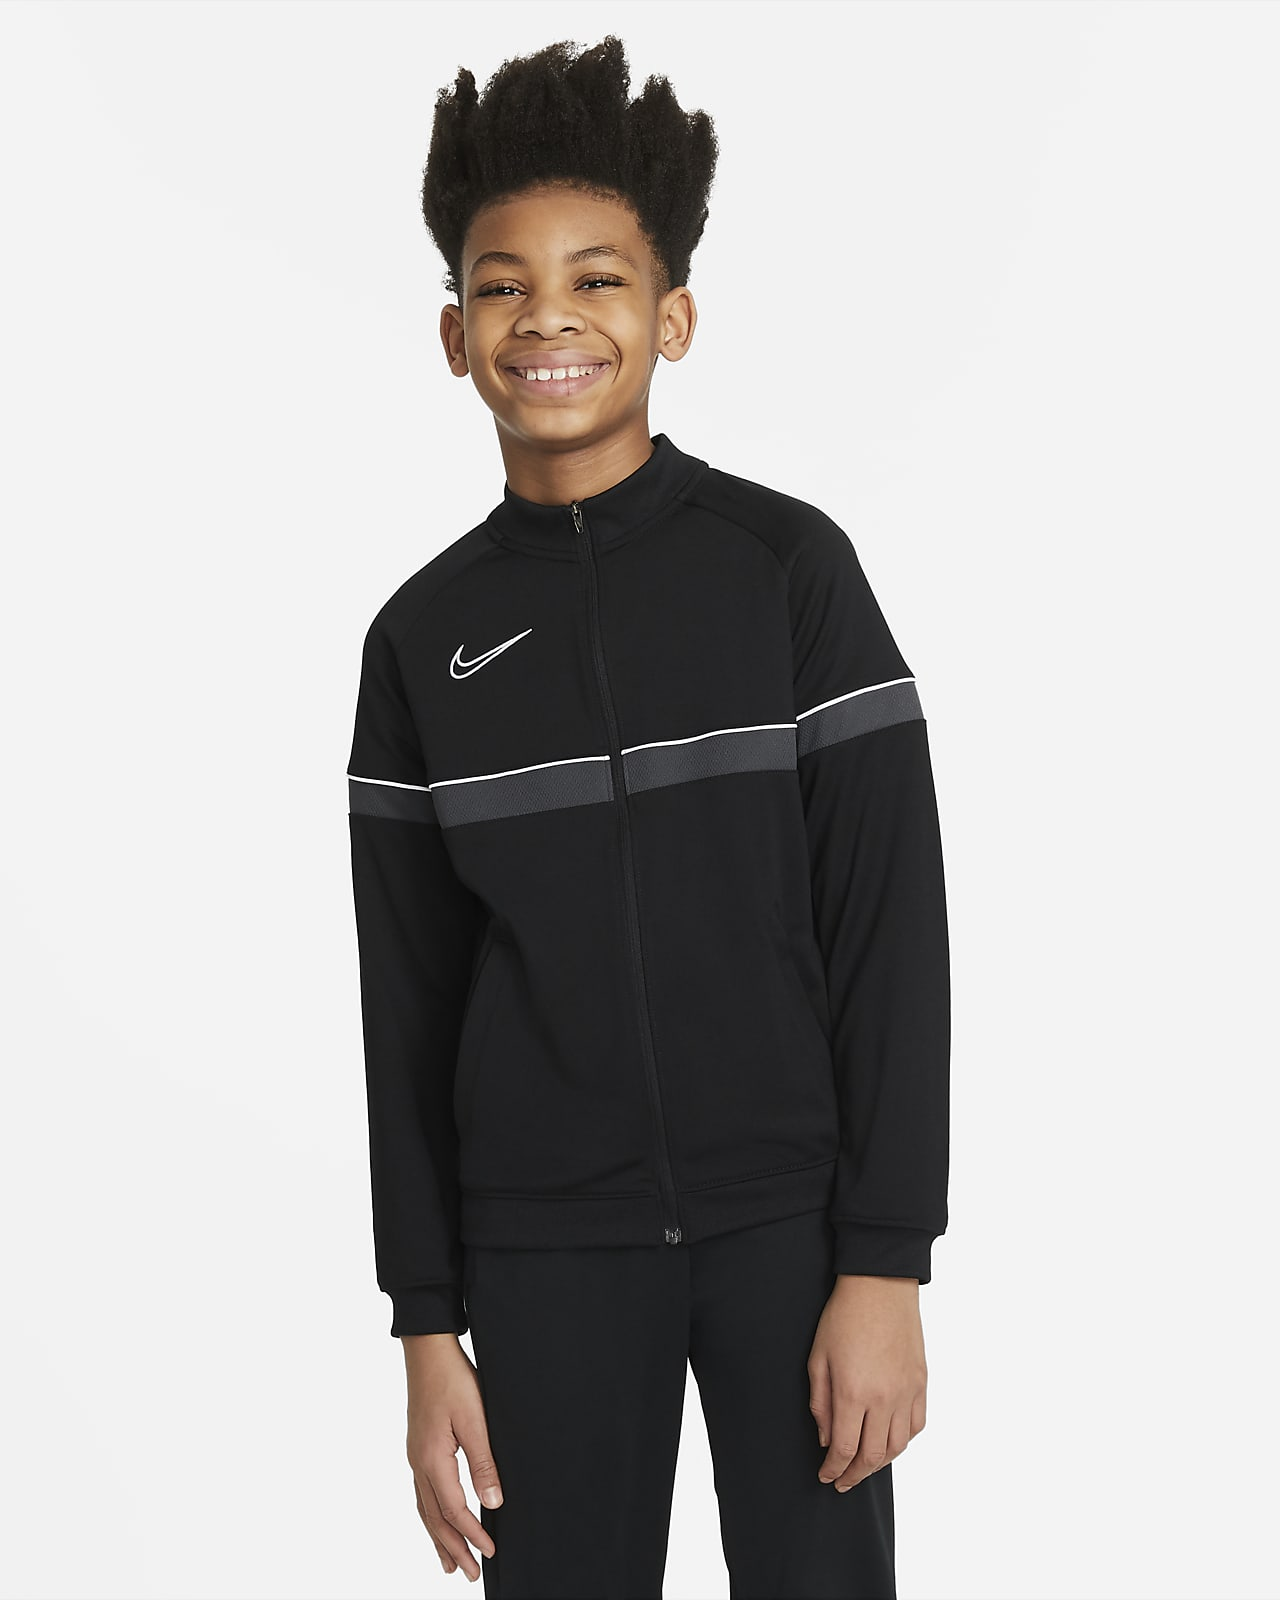 Nike Dri-FIT Academy Big Kids' Knit Soccer Track Jacket